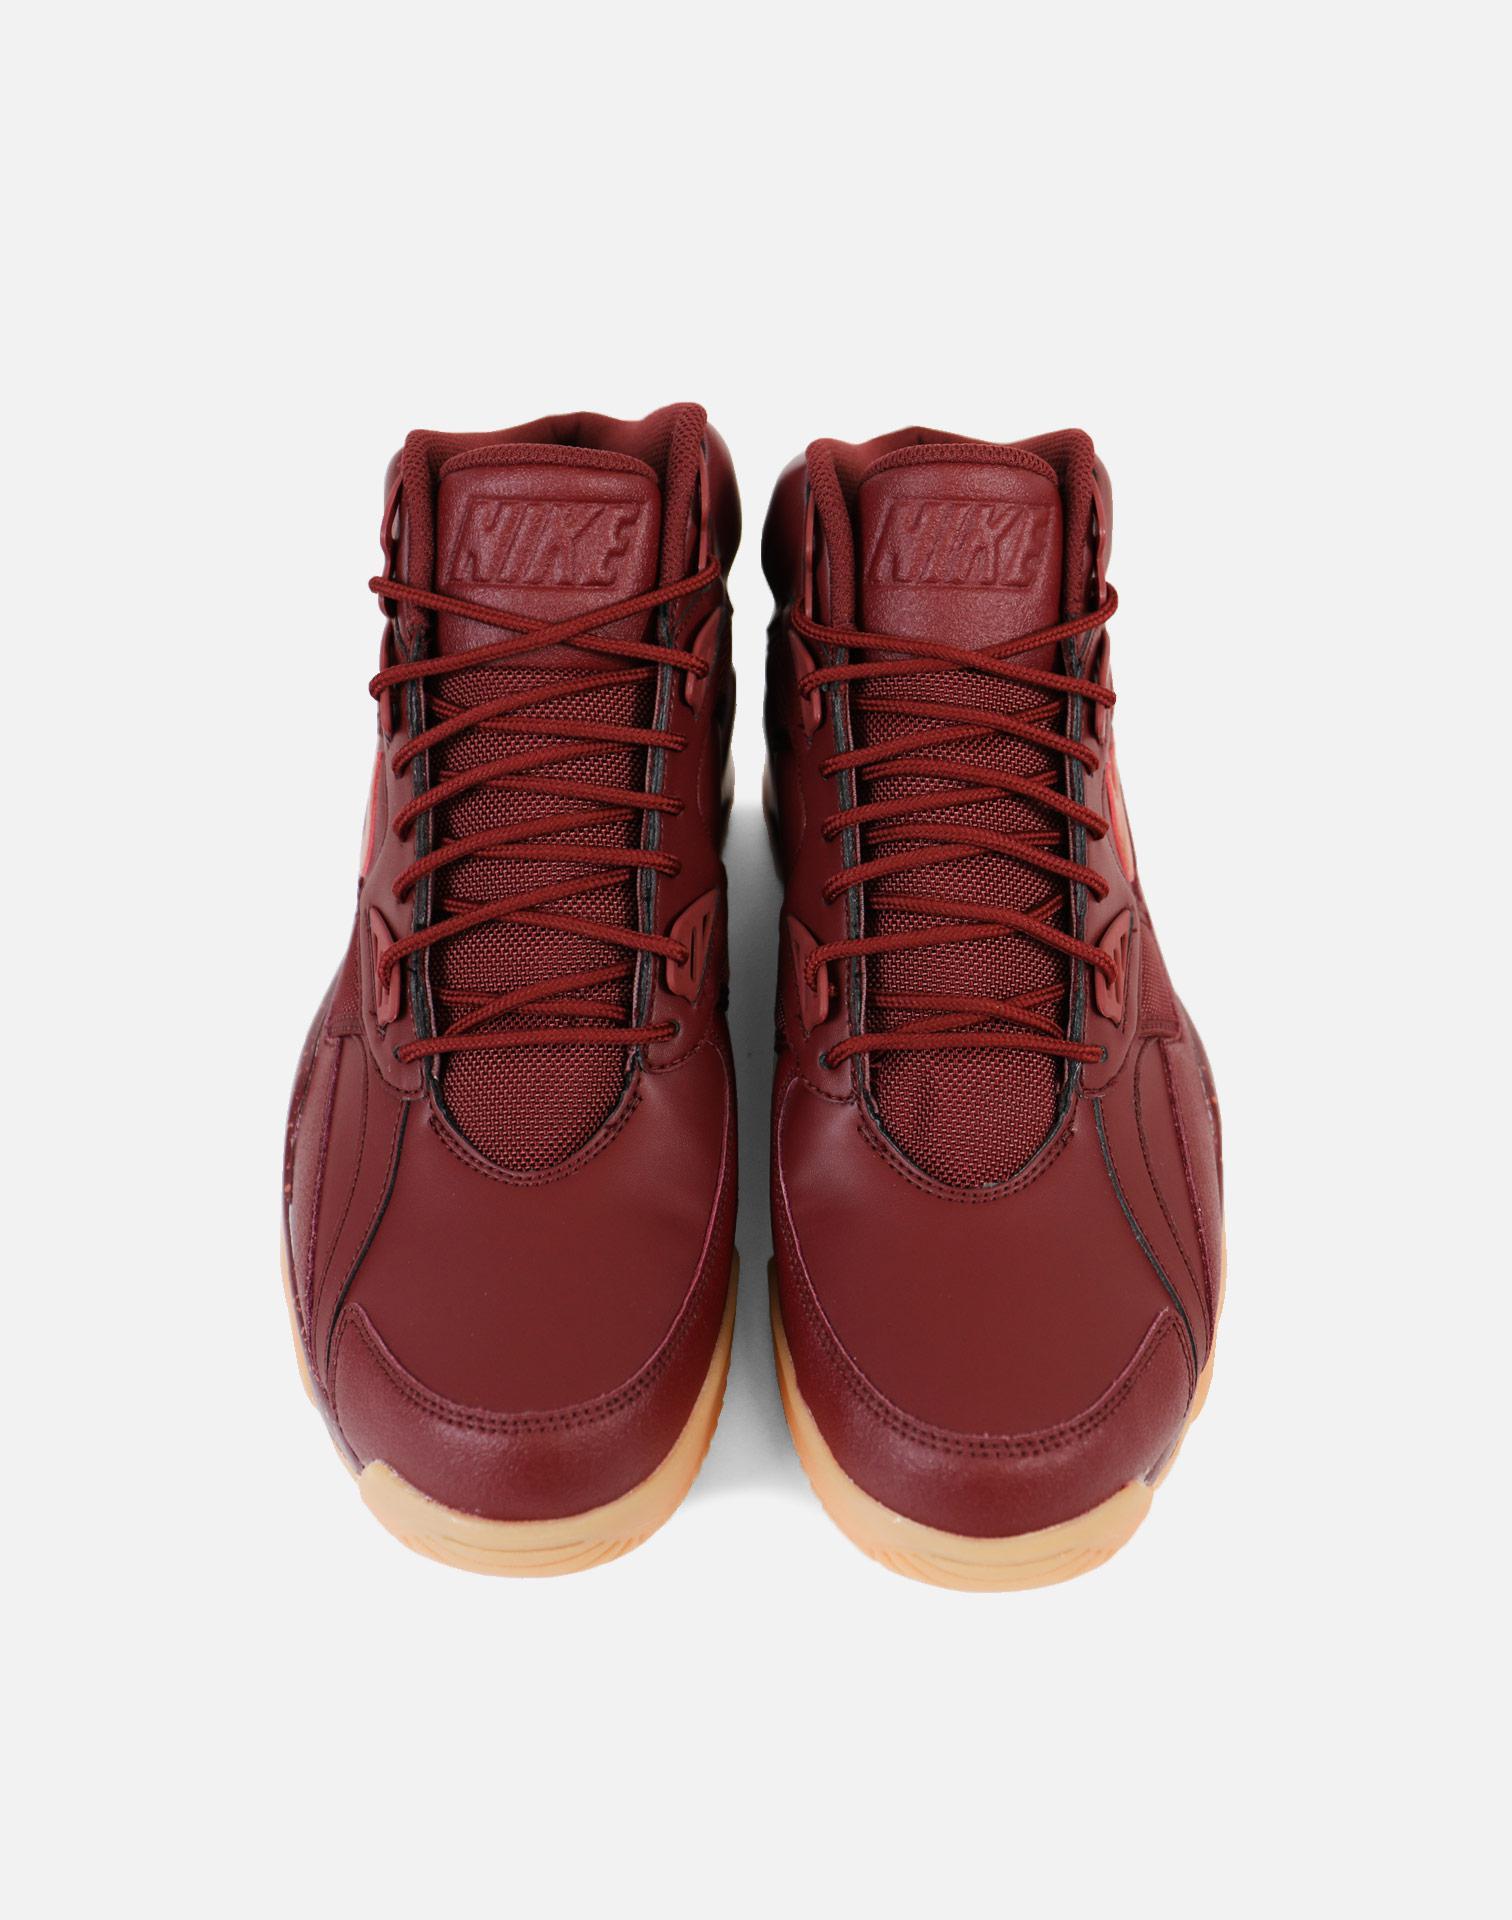 online retailer cc29d d6aed ... CARGO KHAKI SIZE WINTER MEN  Nike - Black Air Trainer Sc Winter-dark  Team Red Dusty Peach for Men ...